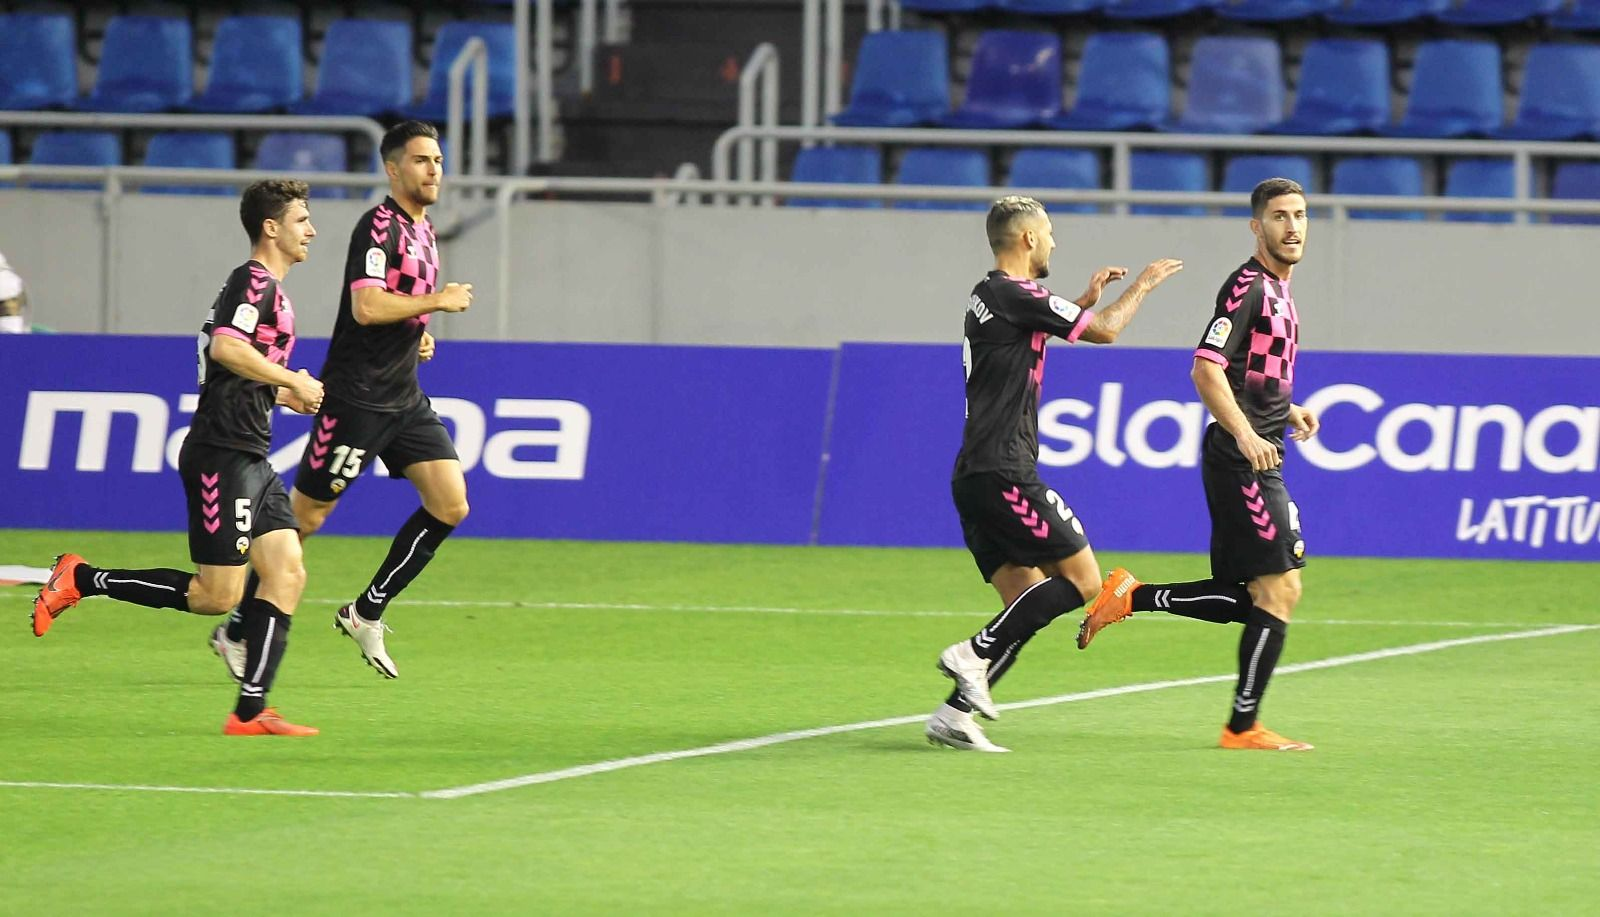 El Sabadell suma el quart triomf de la temporada | LaLiga